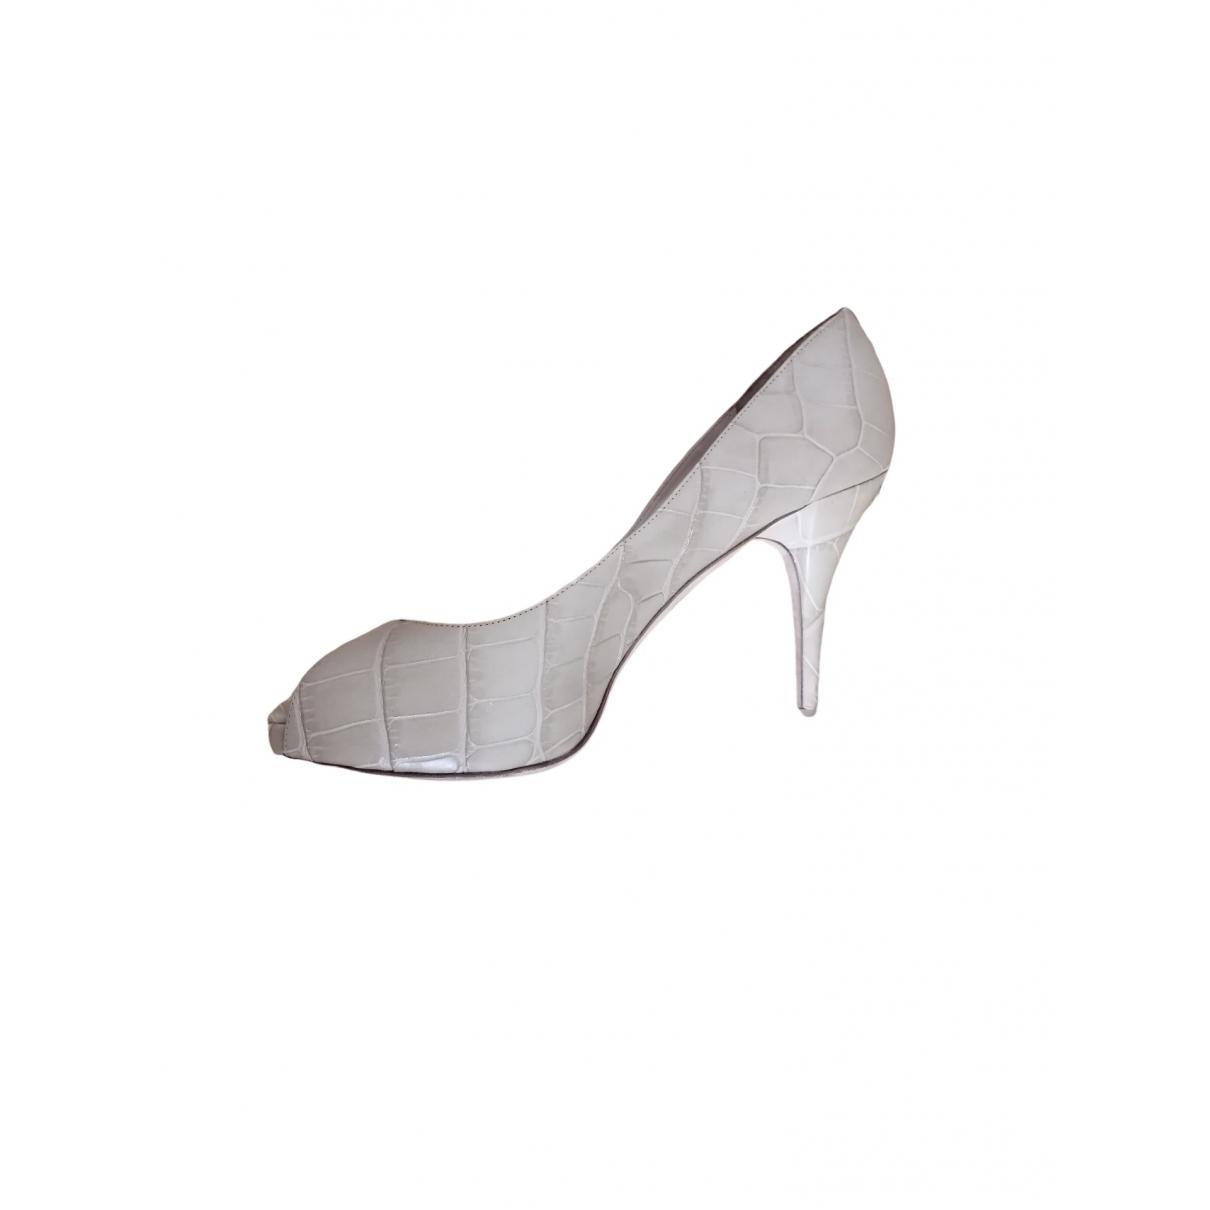 Jimmy Choo \N Beige Leather Heels for Women 39 EU